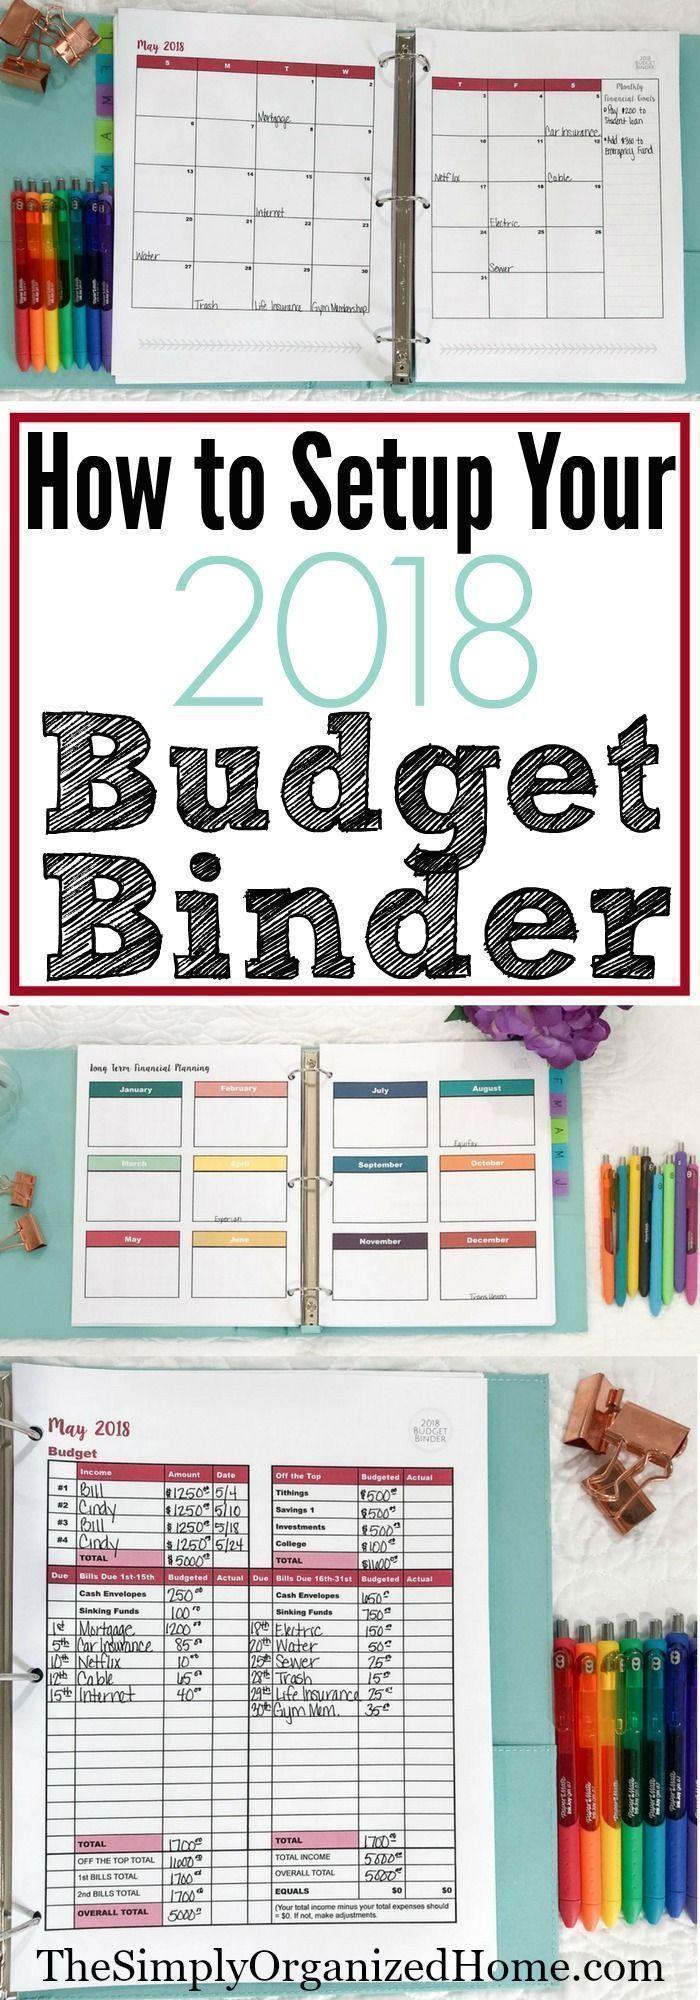 how to setup your 2018 budget binder